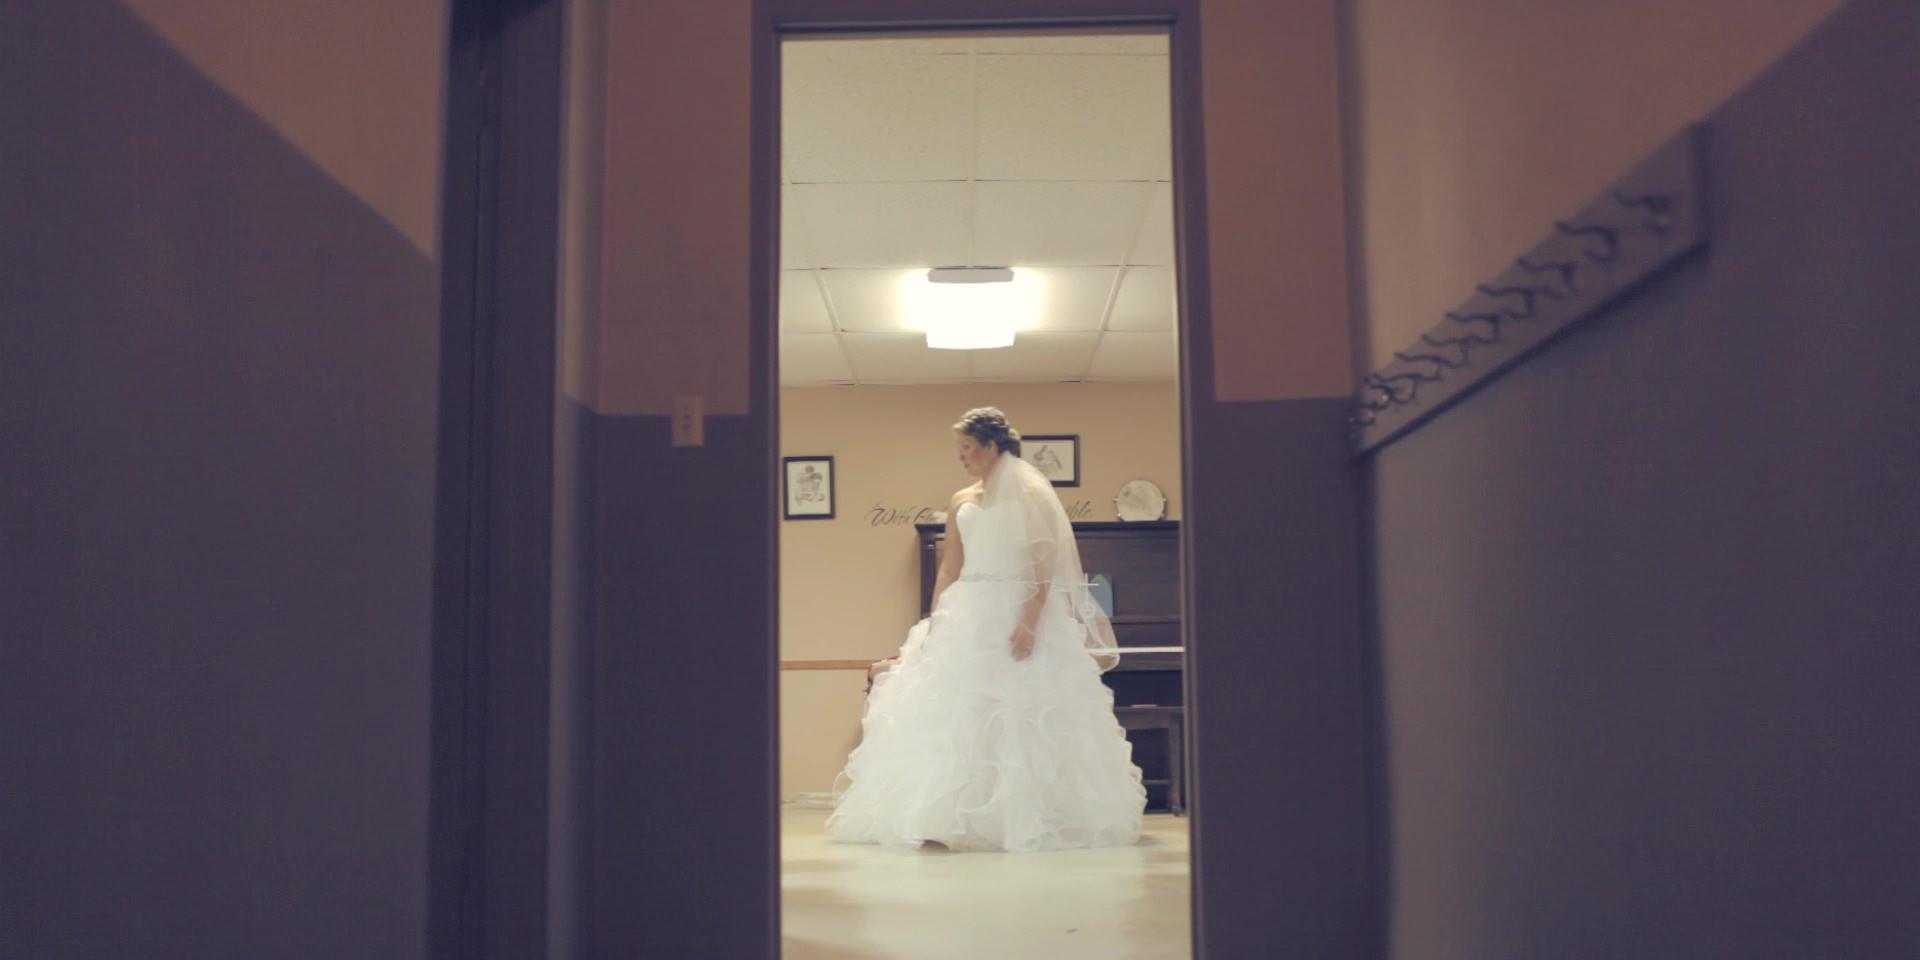 eric&lindsey wedding story.mp4-still00004.jpg